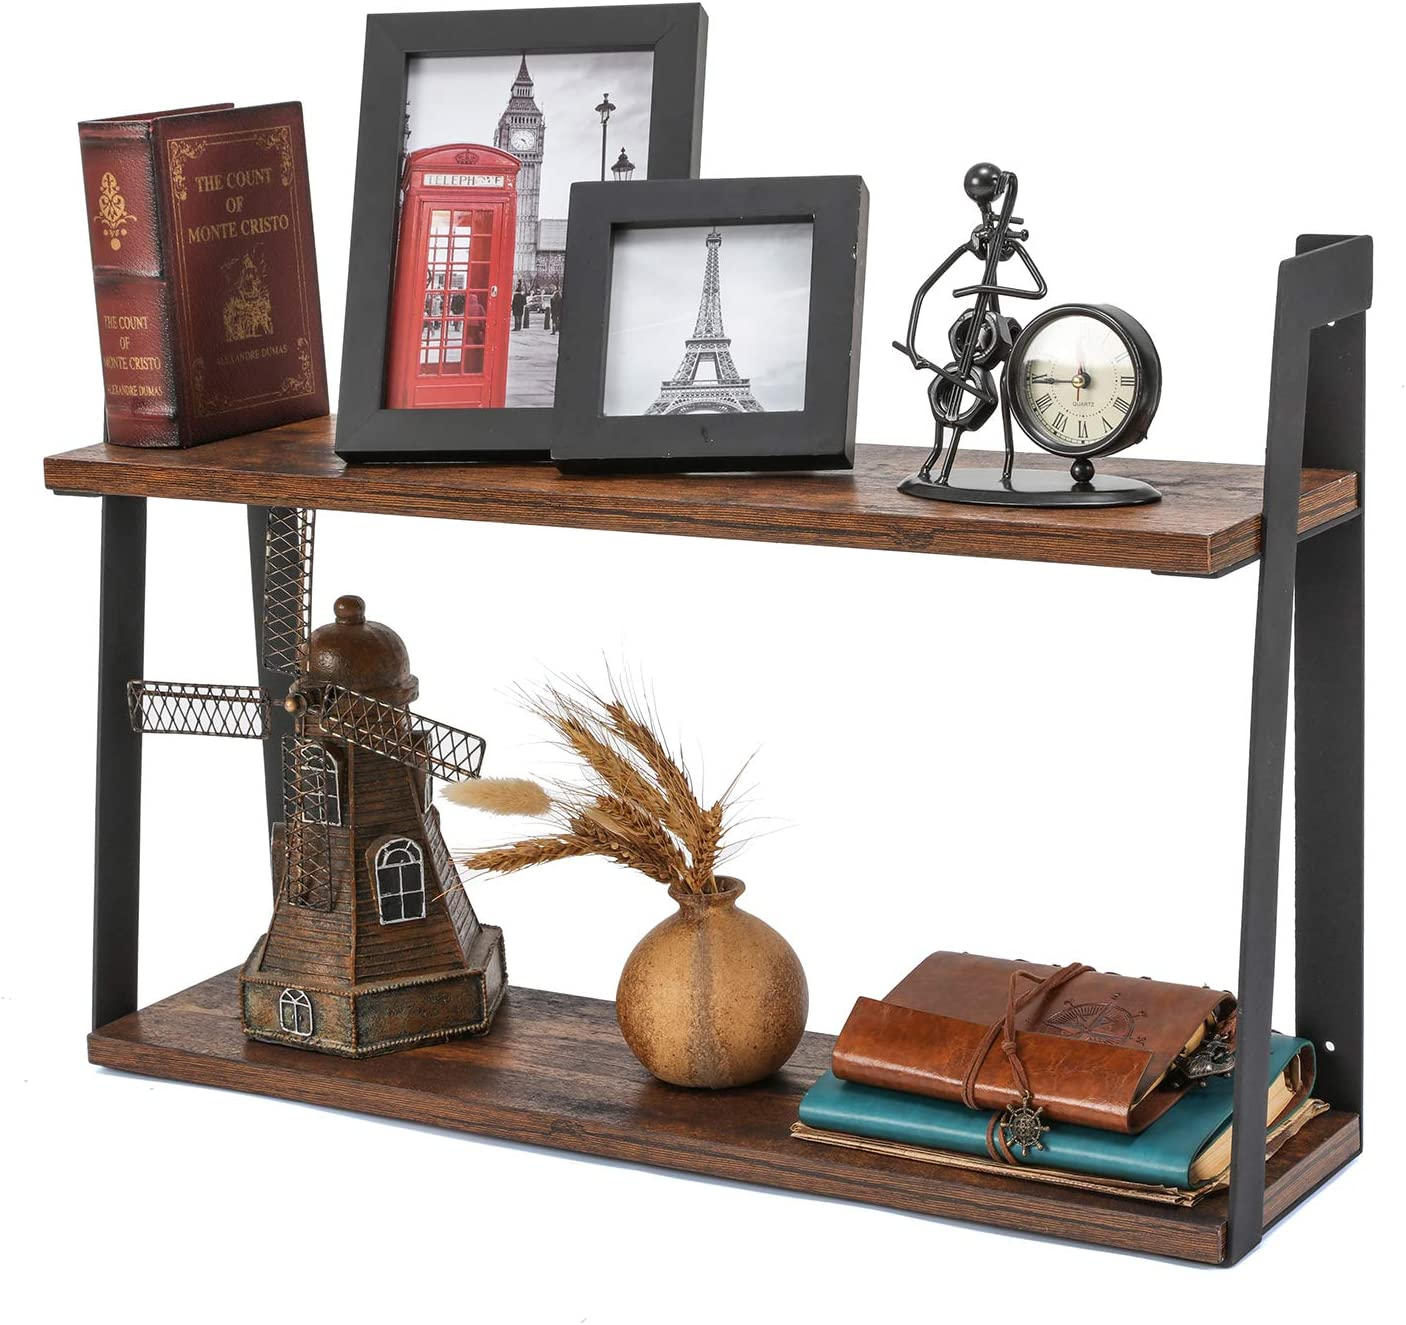 MaidMAX Floating Shelves, 2 Tier Rustic Shelf, Display Storage Ledge, Wall Mounted Shelf with Metal Brackets for Living Room, Bathroom, Bedroom, Kitchen, Wood Grain Finish